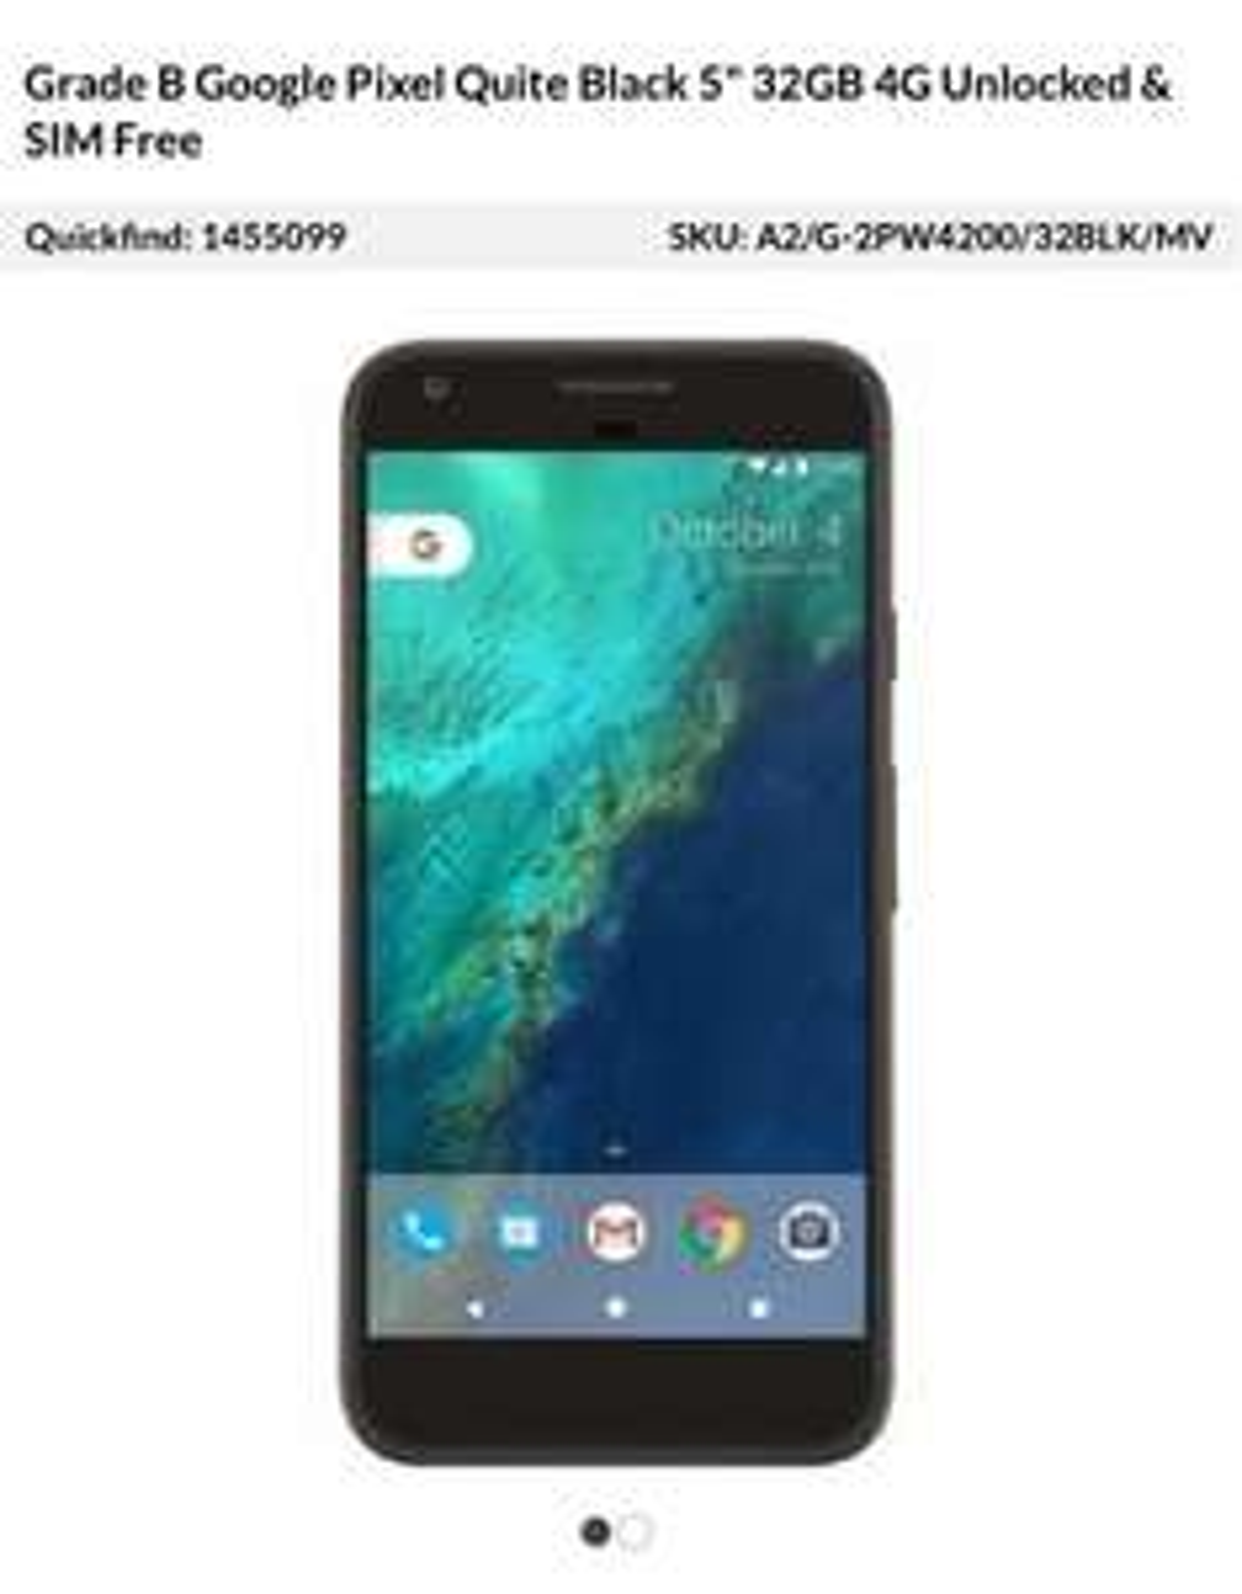 "Grade B Google Pixel Quite Black 5"" 32GB 4G Unlocked & SIM Free £59.97 @ Laptops Direct"